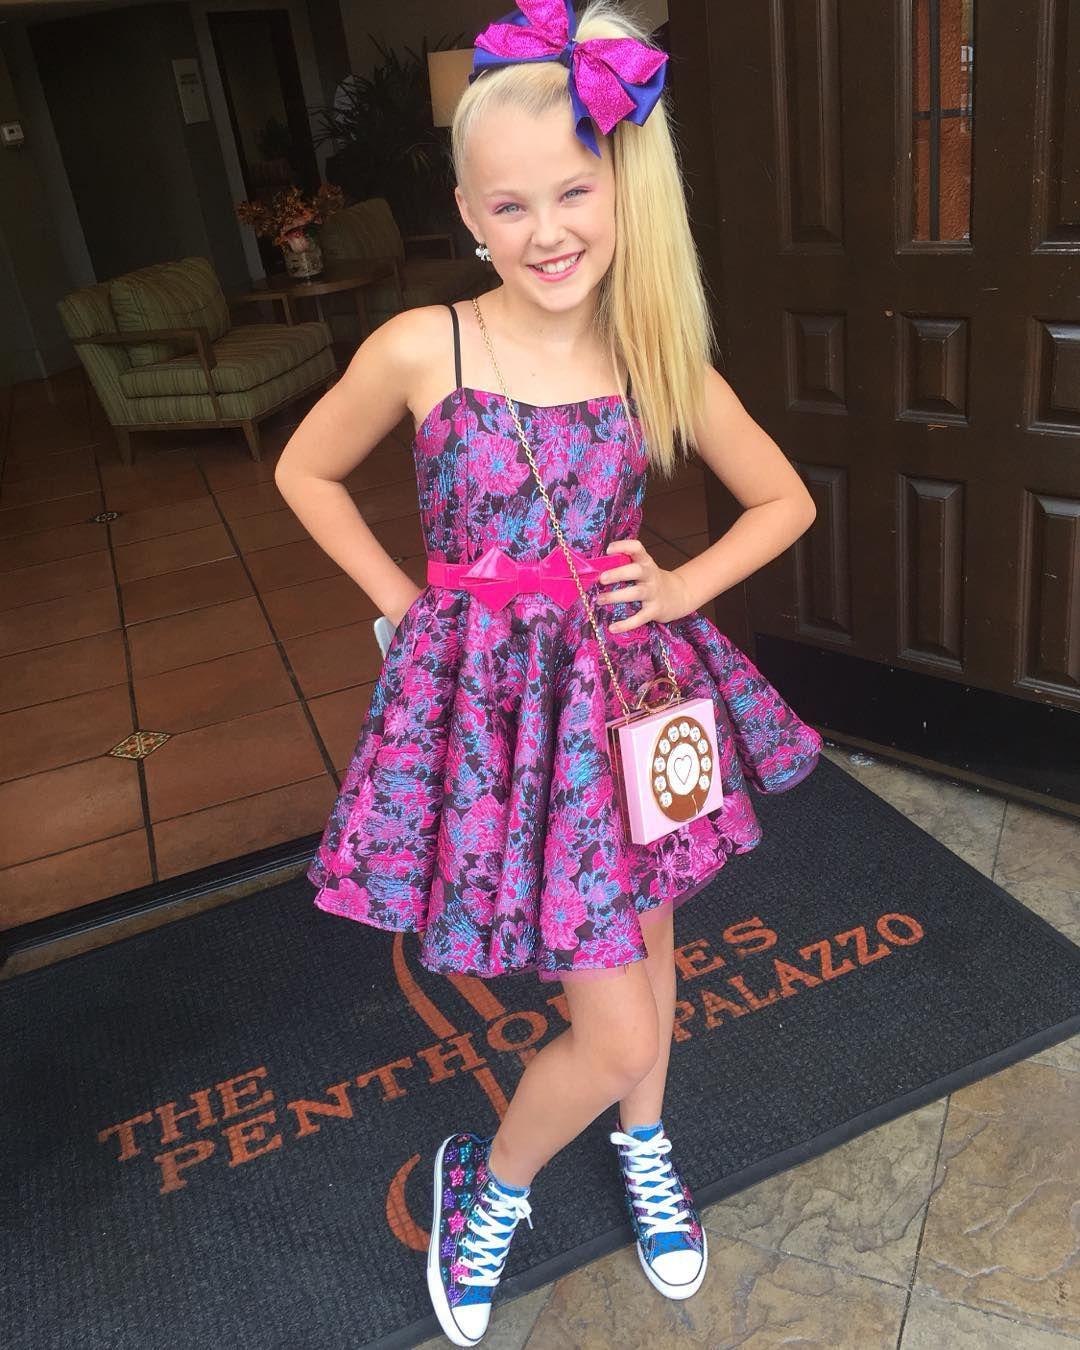 Pin de Jenna en JoJo Siwa | Pinterest | Vestidos niña y Vestiditos